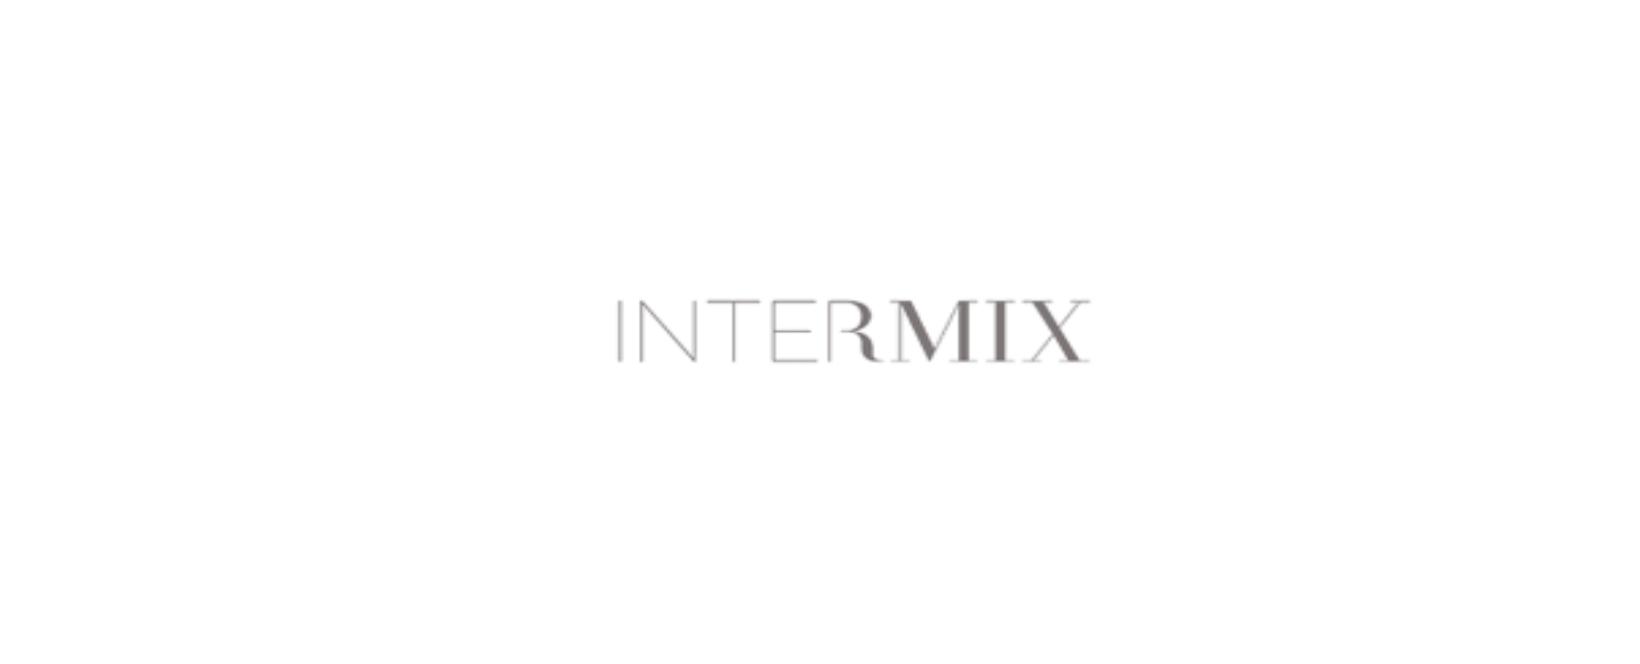 INTERMIX Discount Code 2021